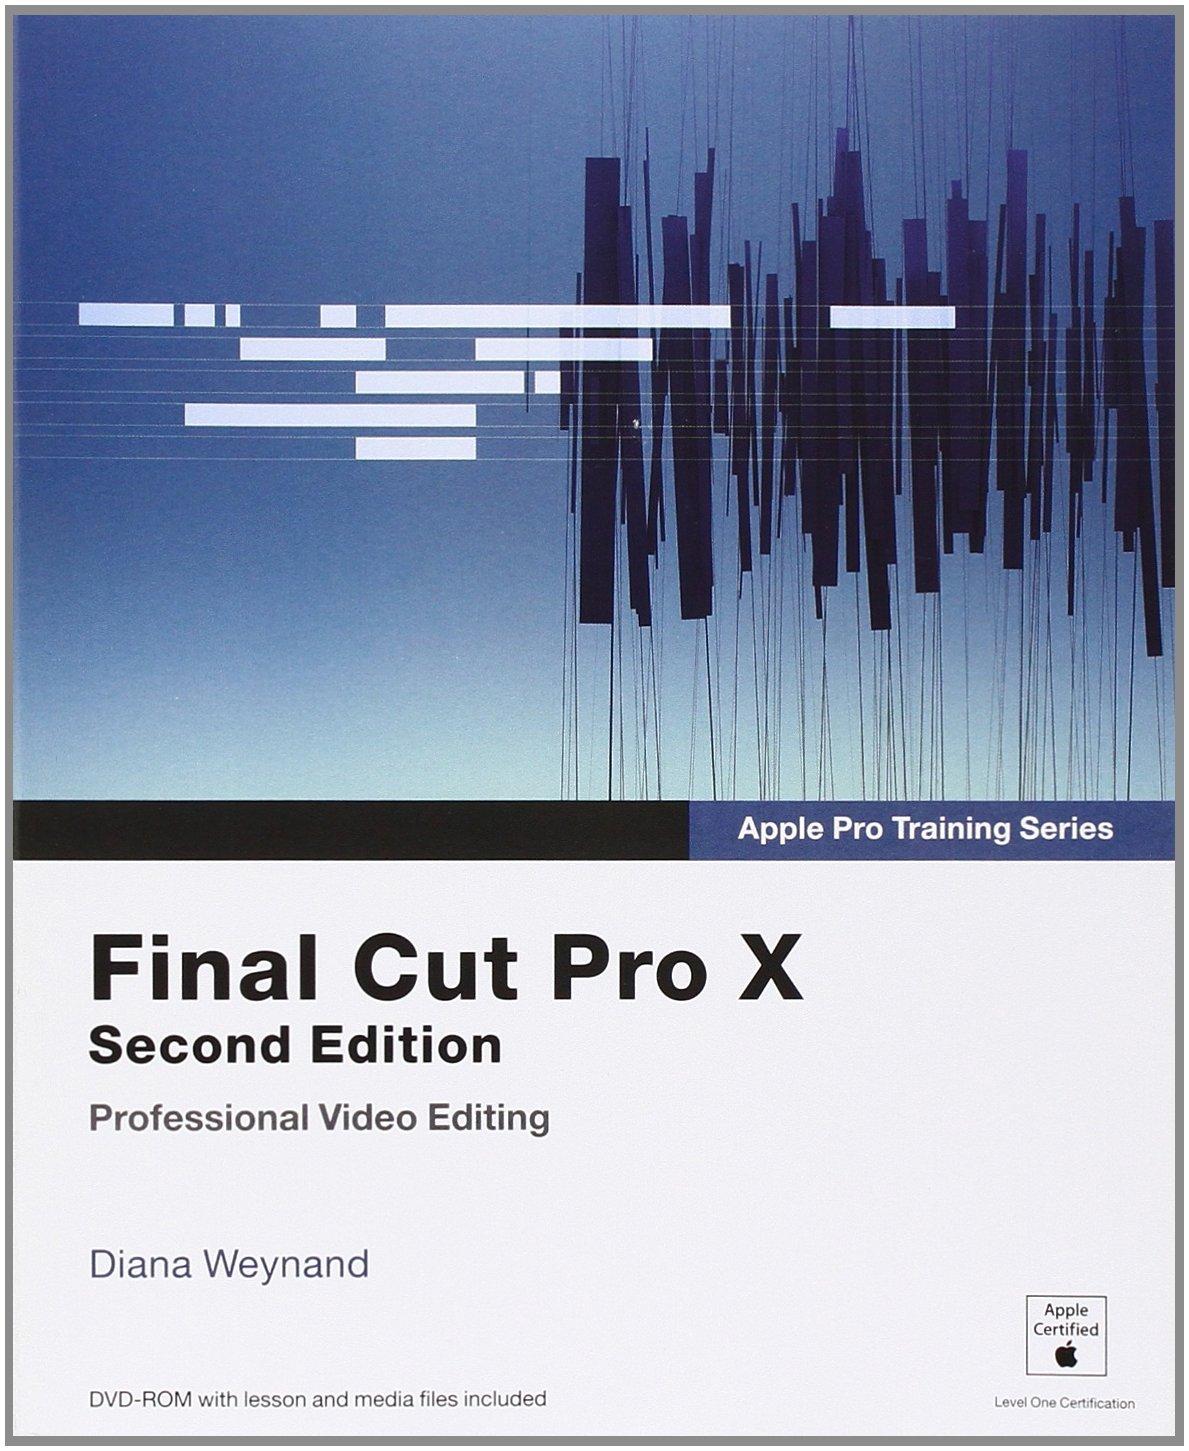 Apple Pro Training Series Final Cut Pro X 2nd Edition Diana